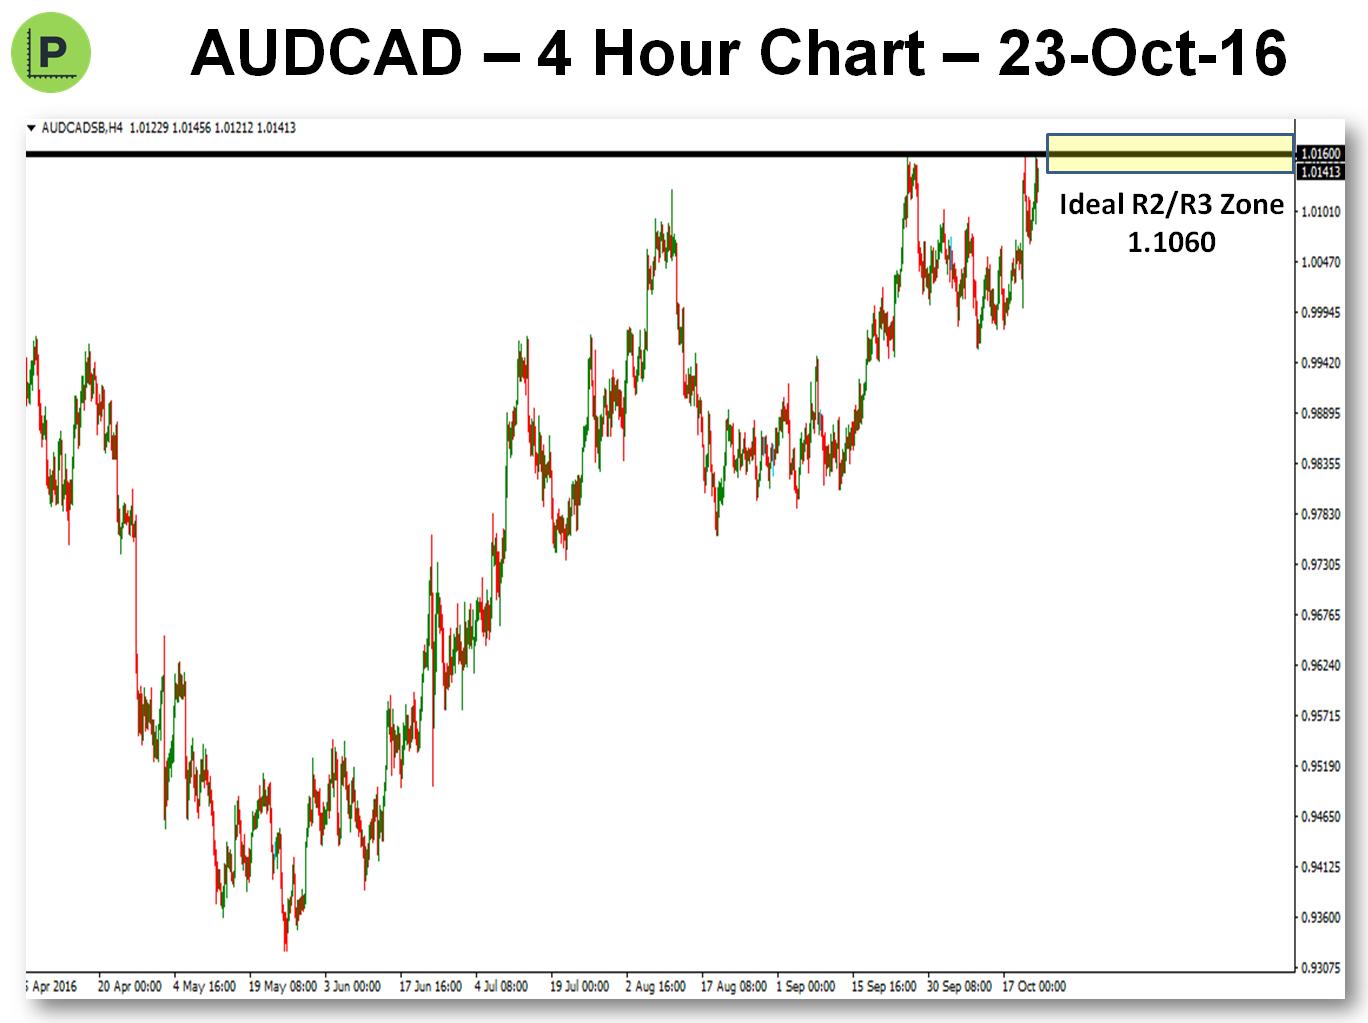 potential-pivot-trade-23-oct-16-audcad